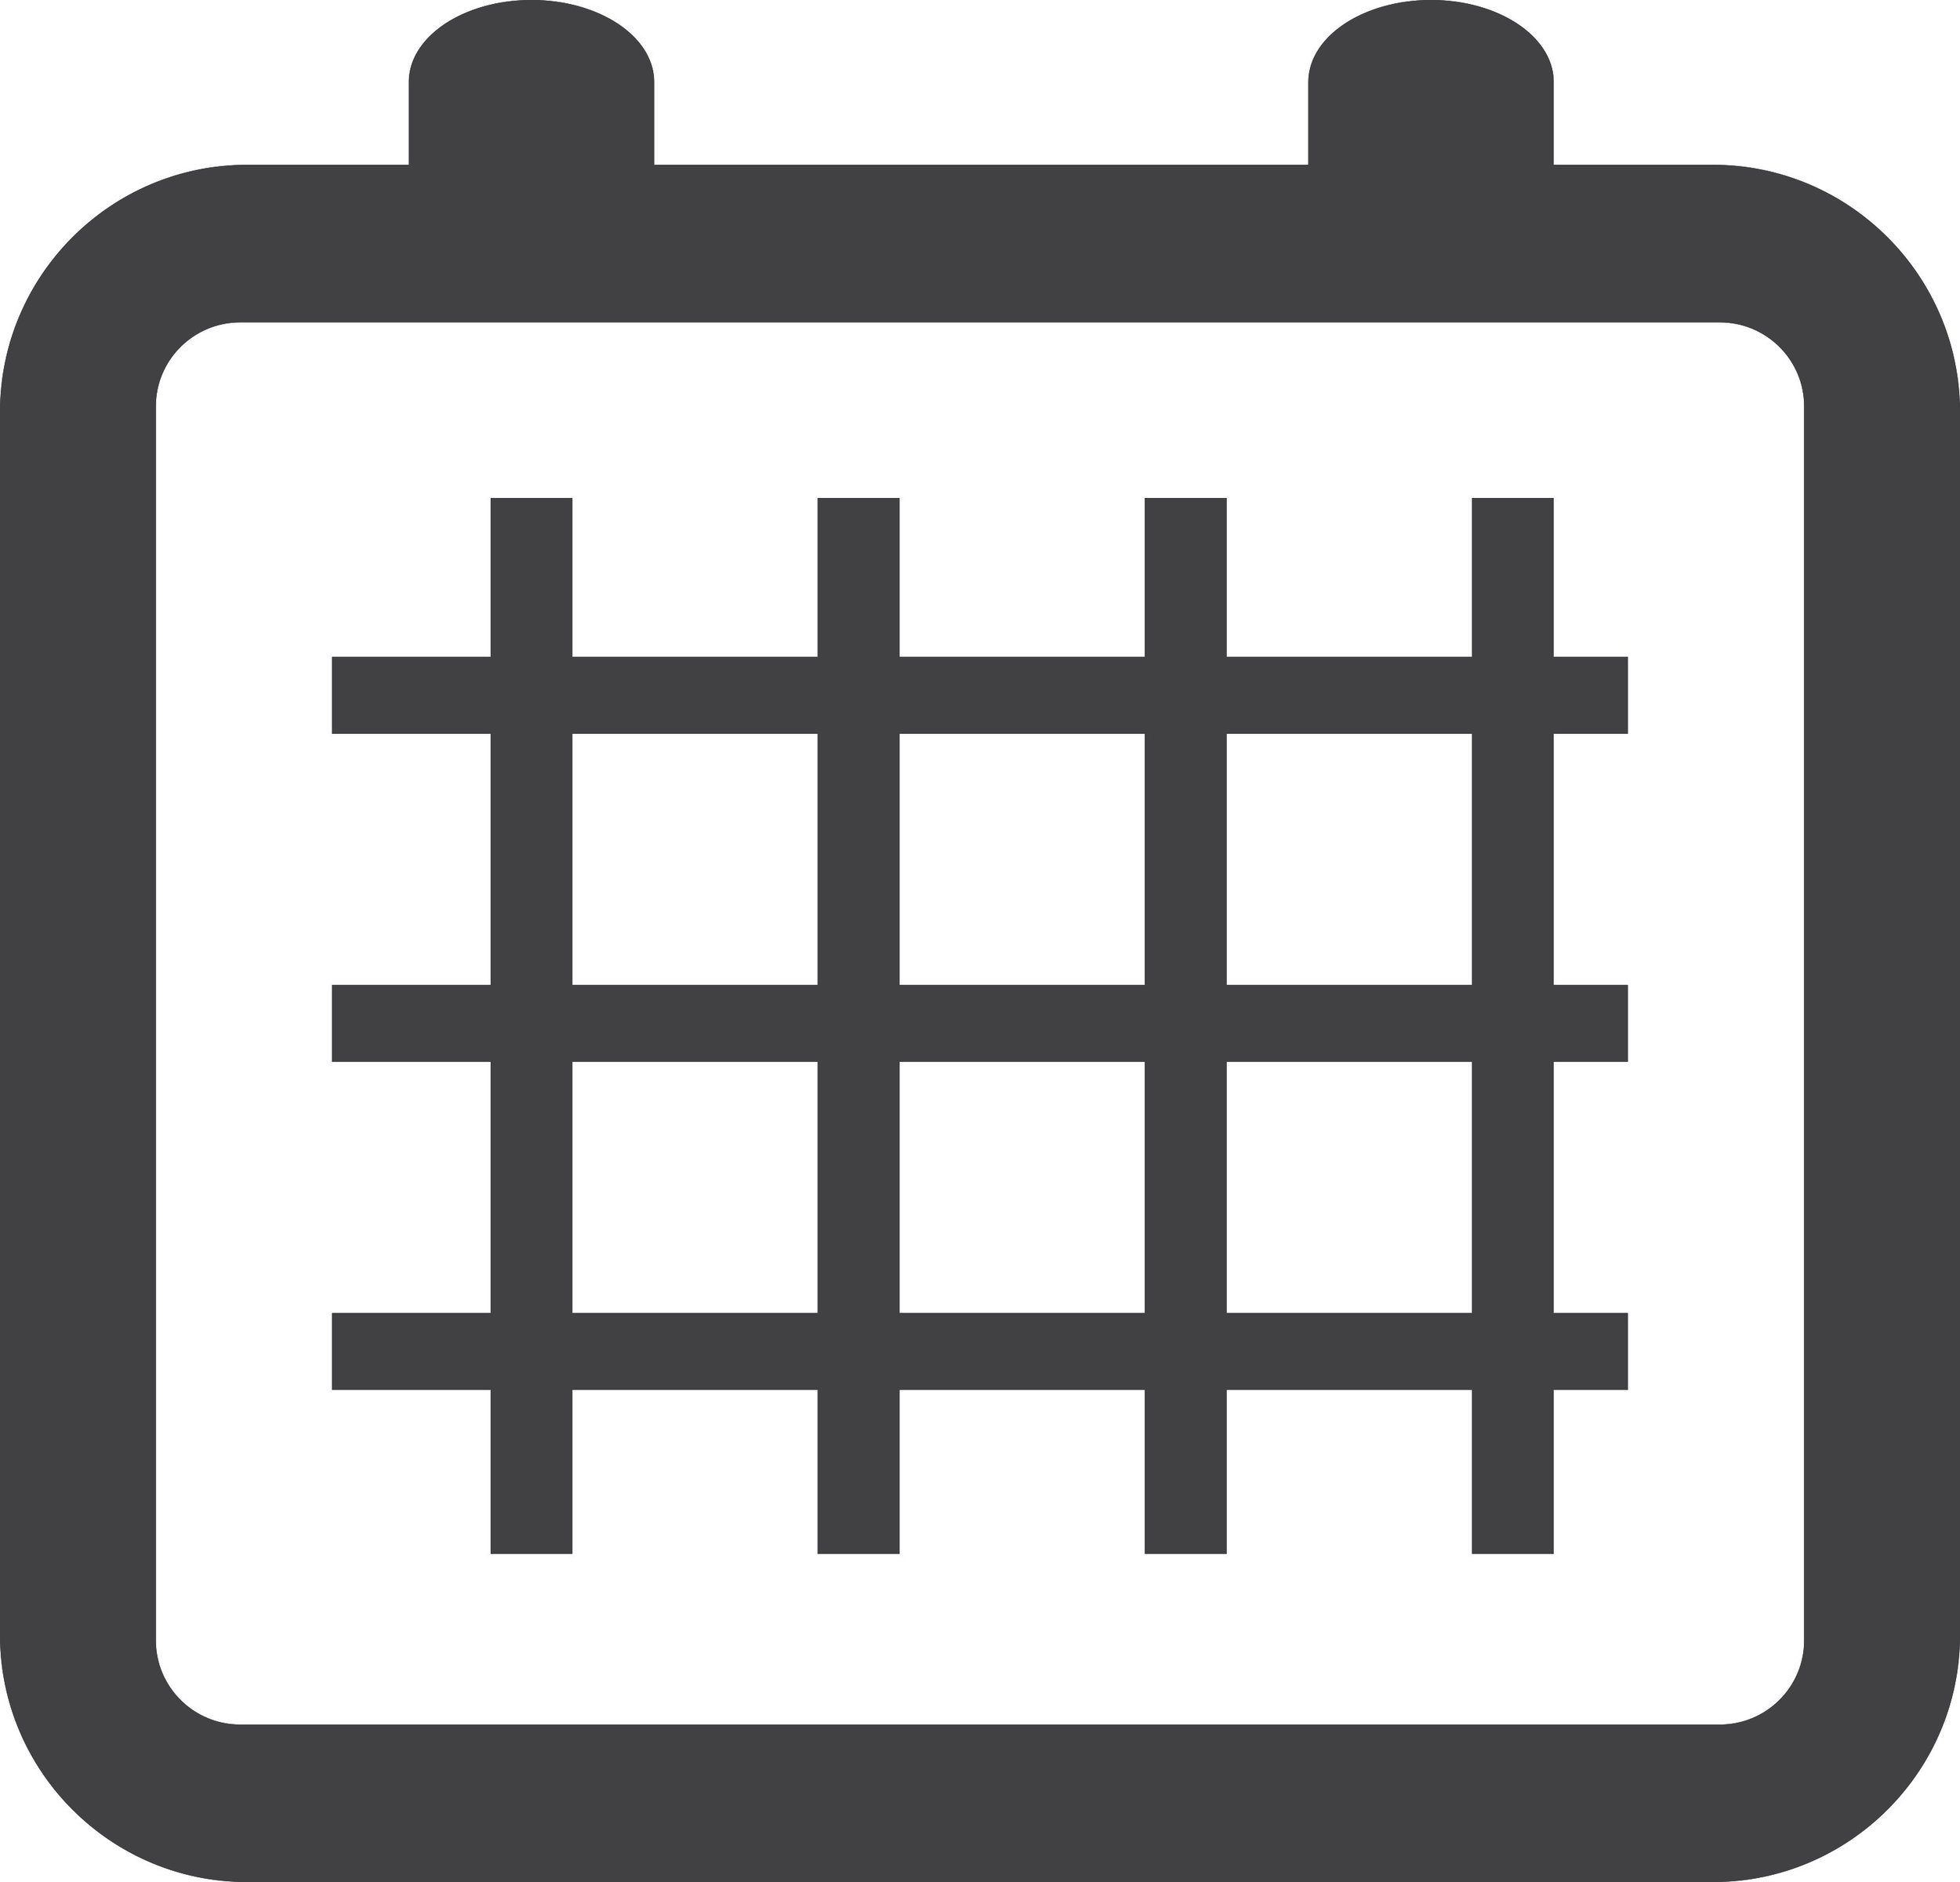 abstract-calendar_GJi2SI8u_L.jpg